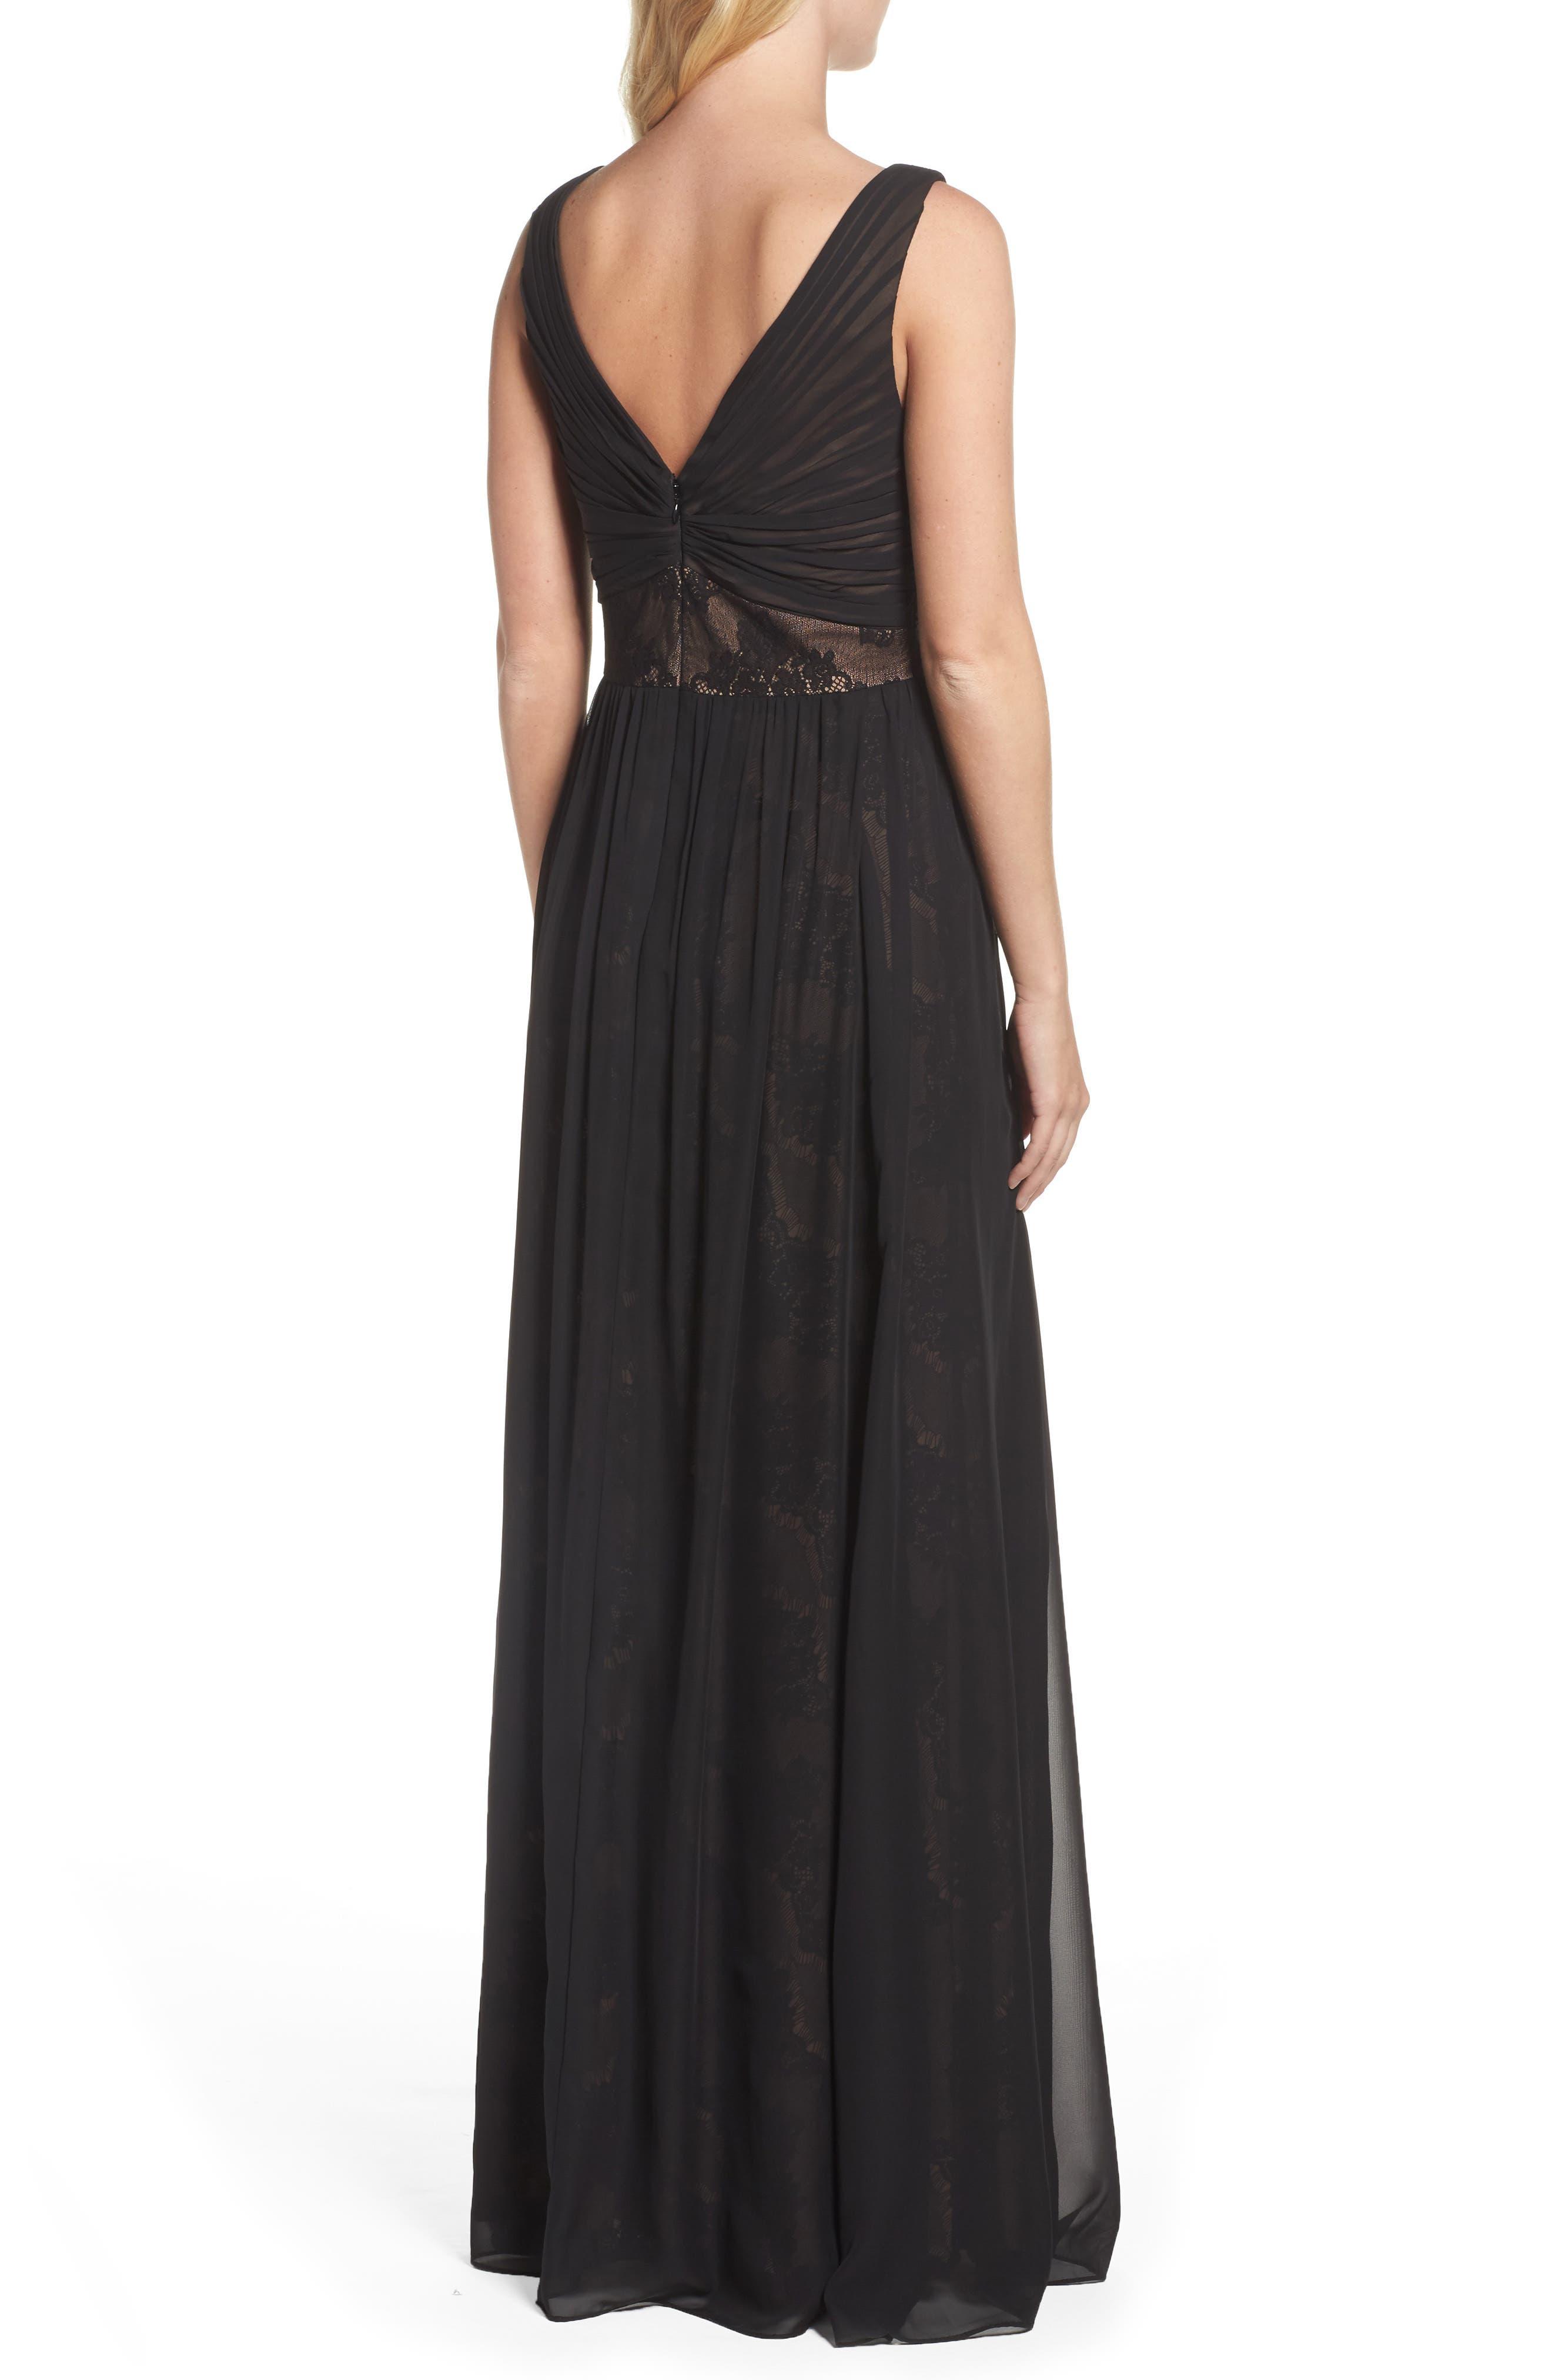 Lace Detail Gown,                             Alternate thumbnail 2, color,                             Black Nude